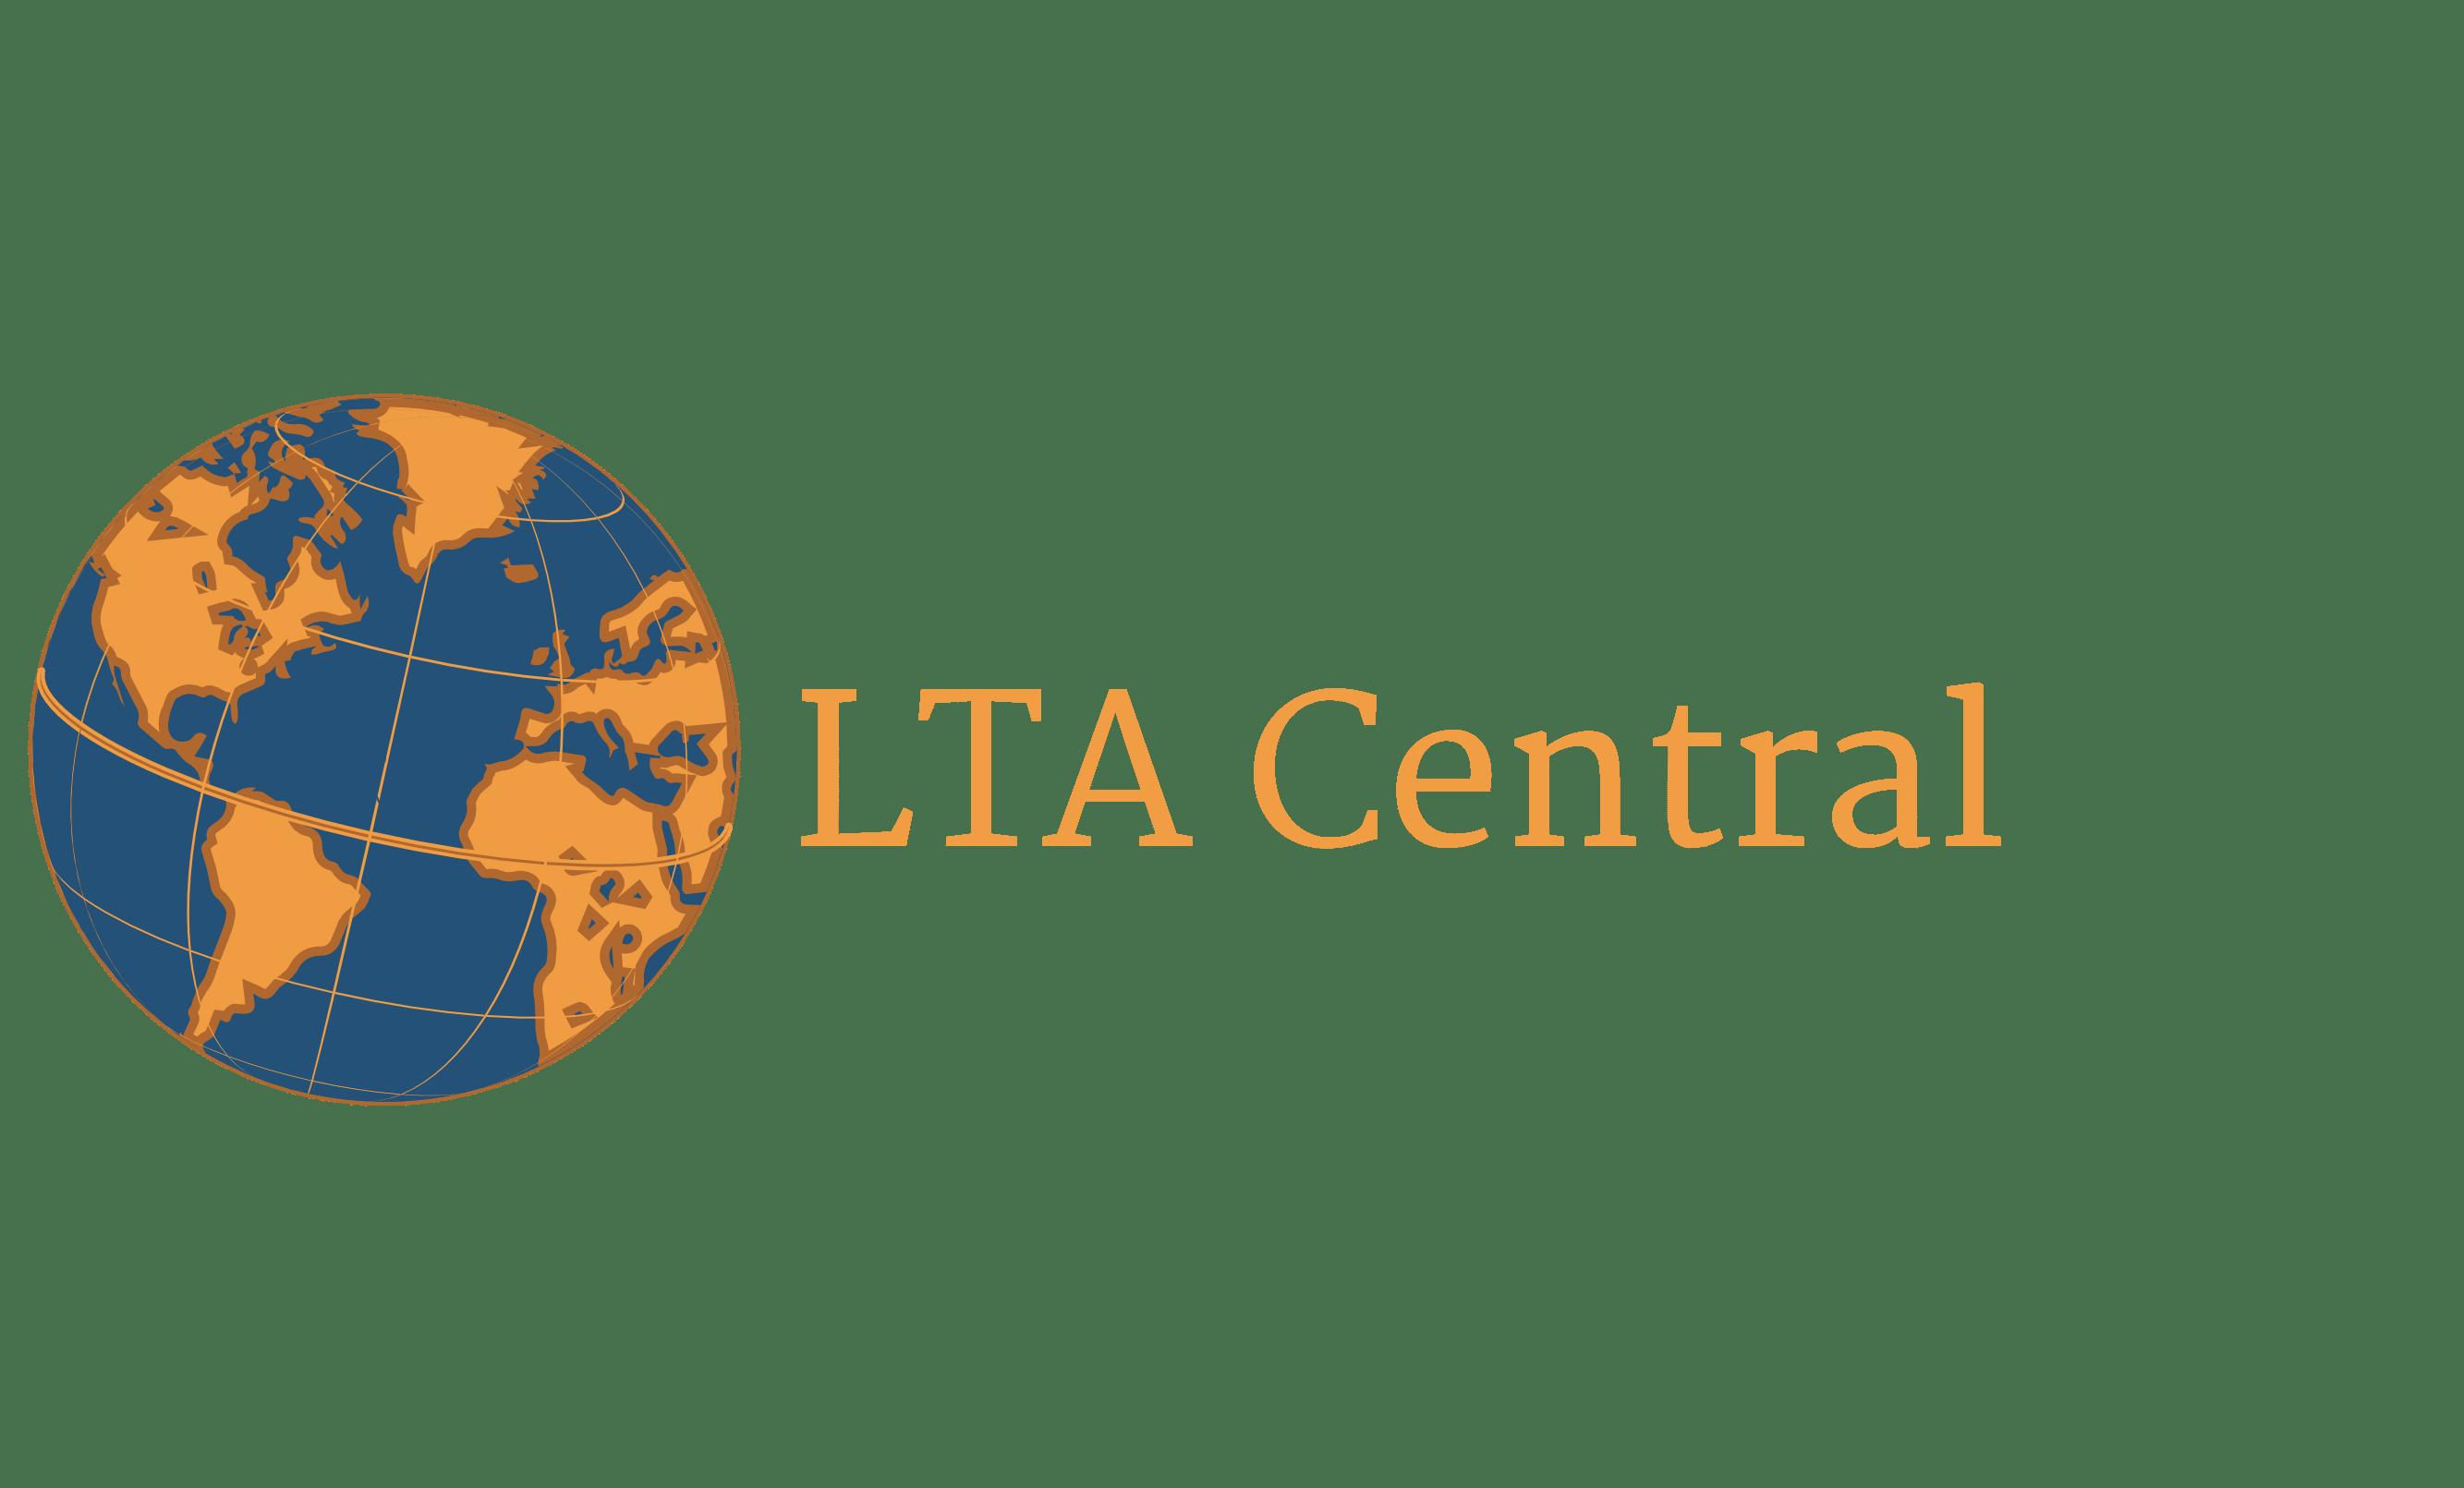 Leisure Travel Alliance Central